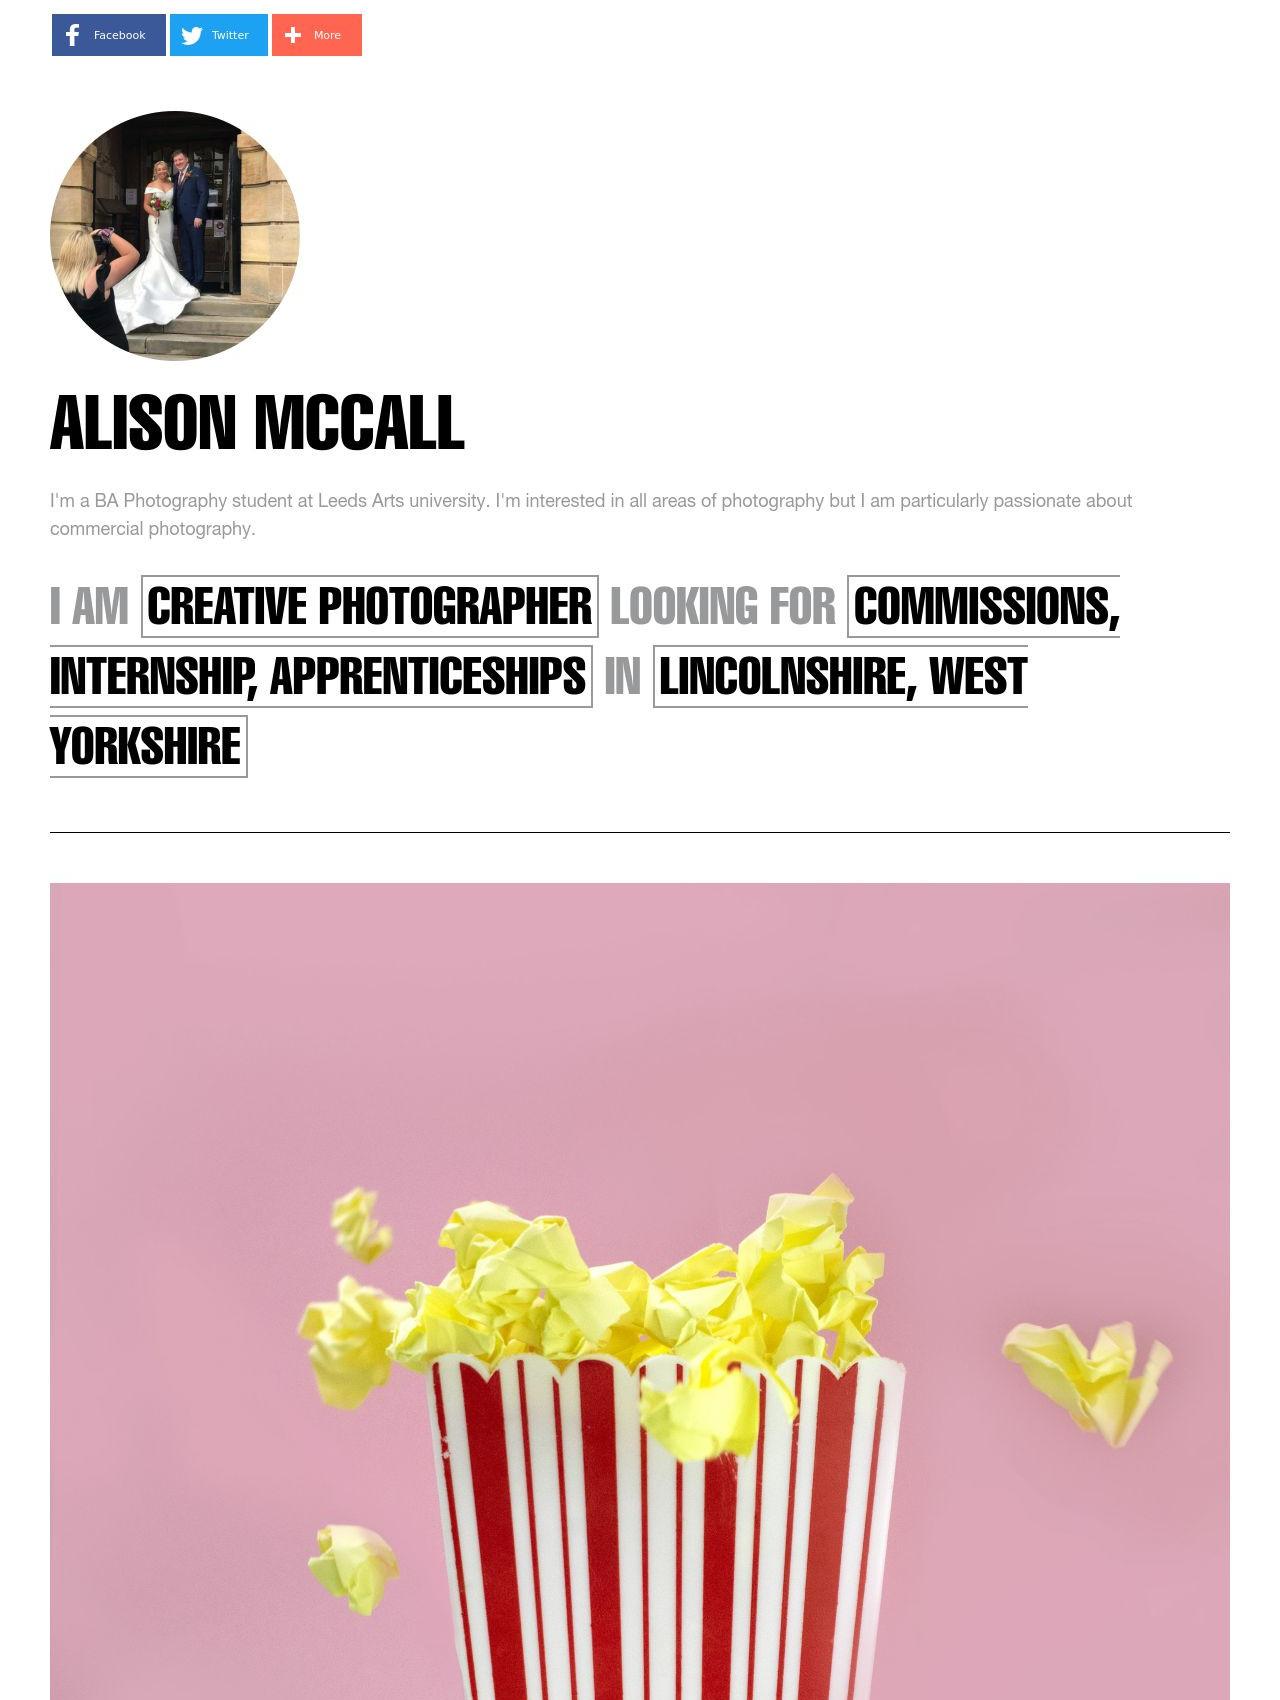 Alison McCall